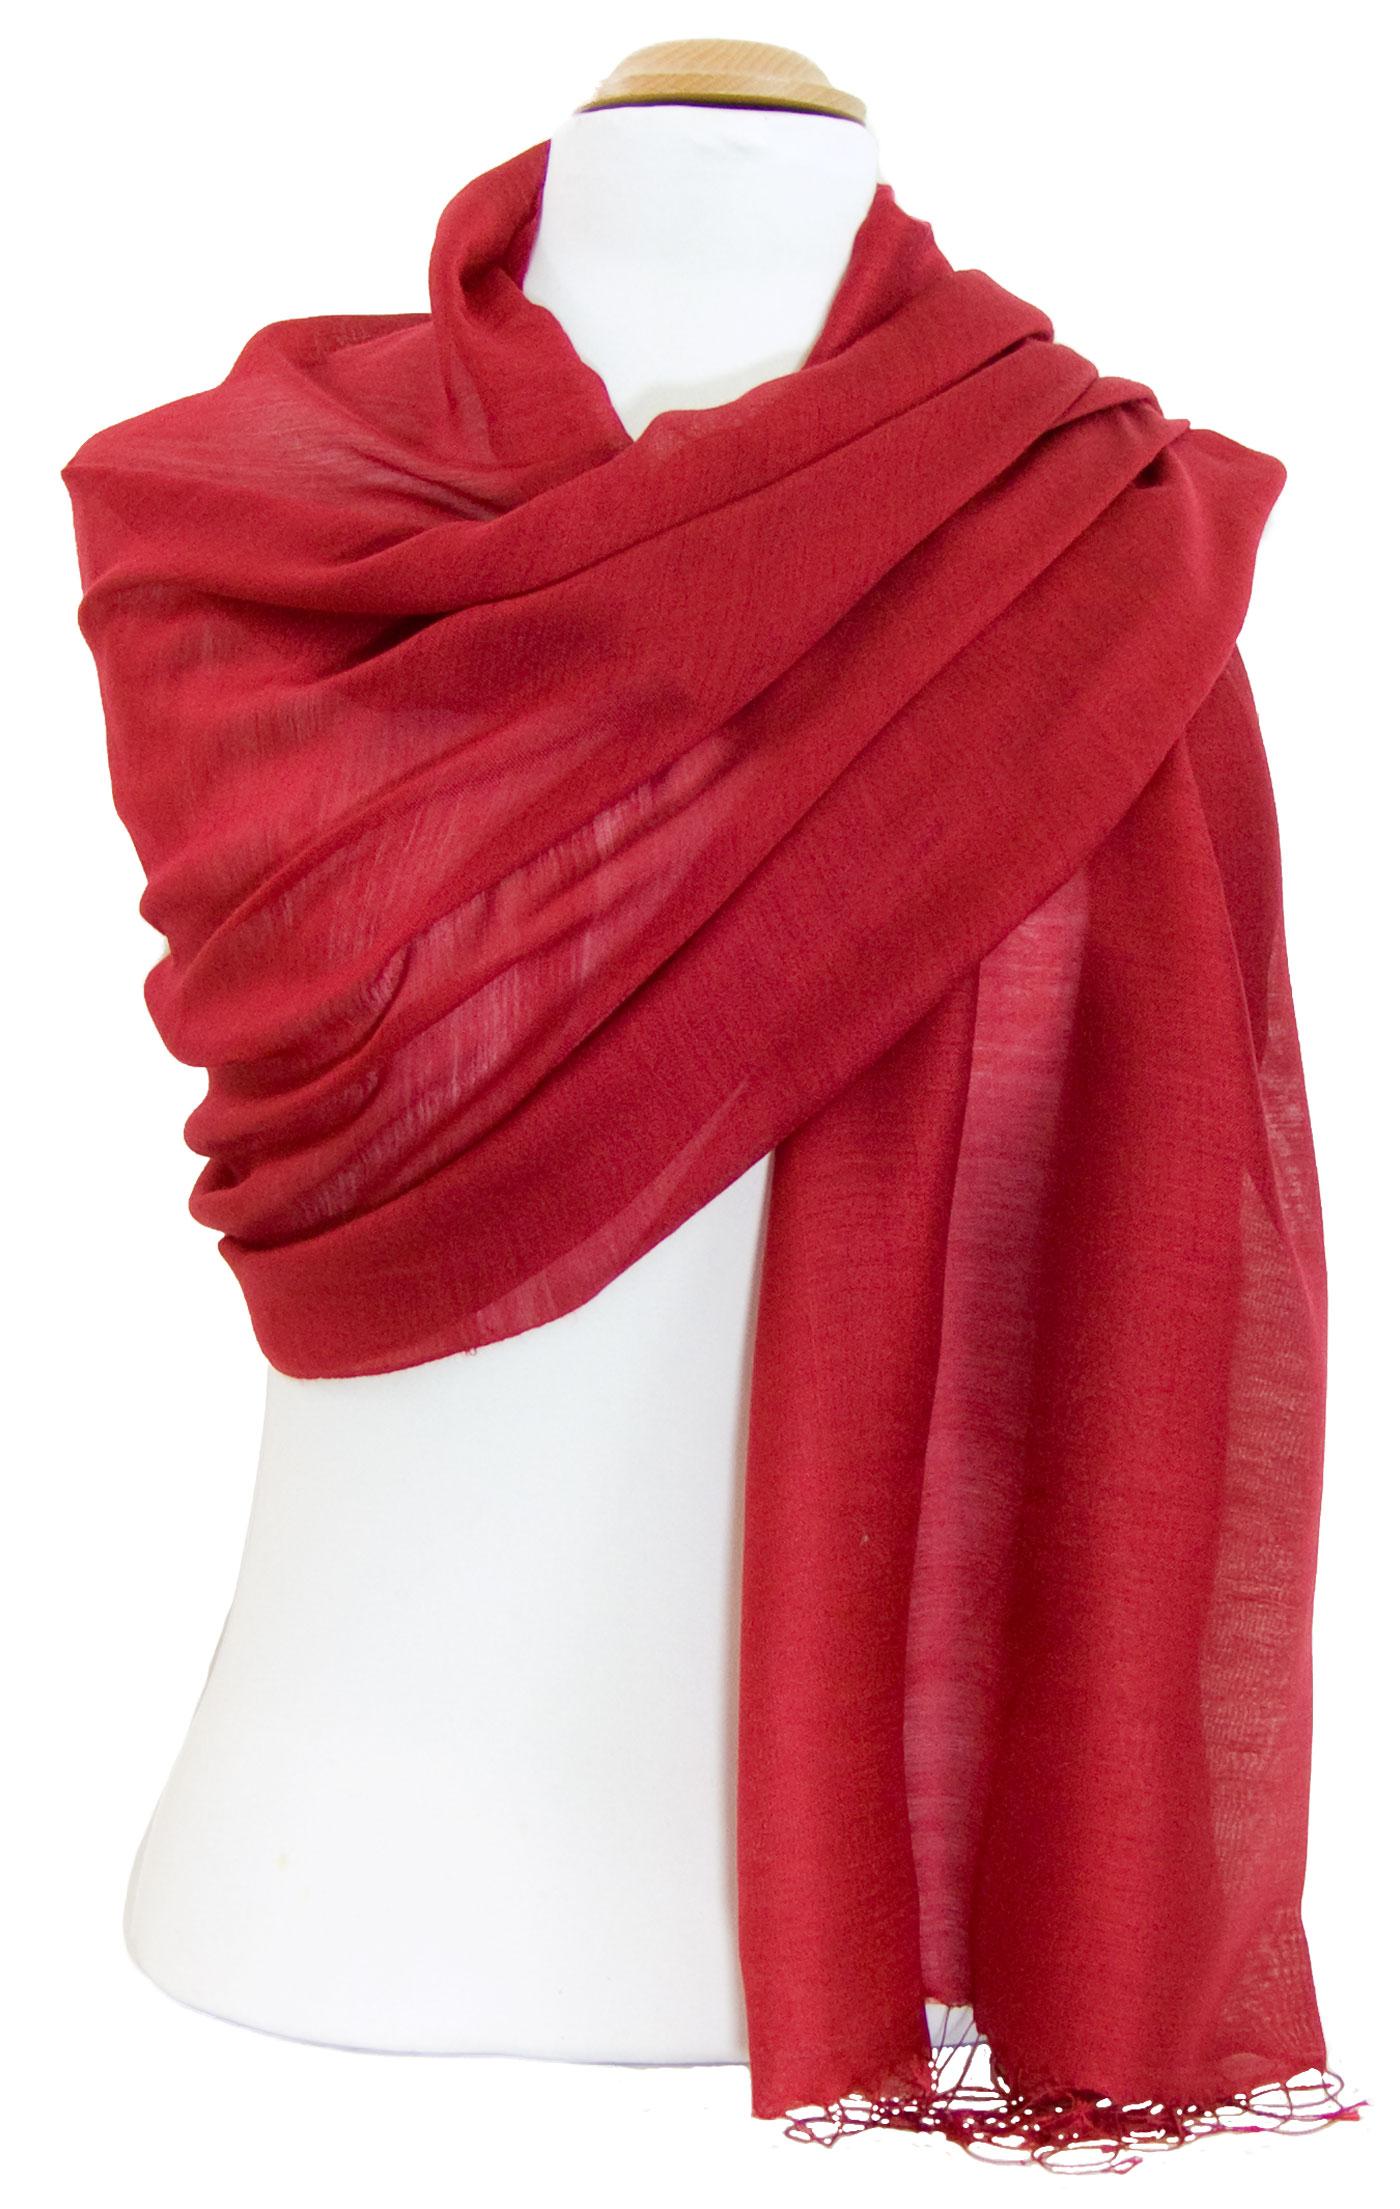 Etole foulard rouge soie viscose Alex